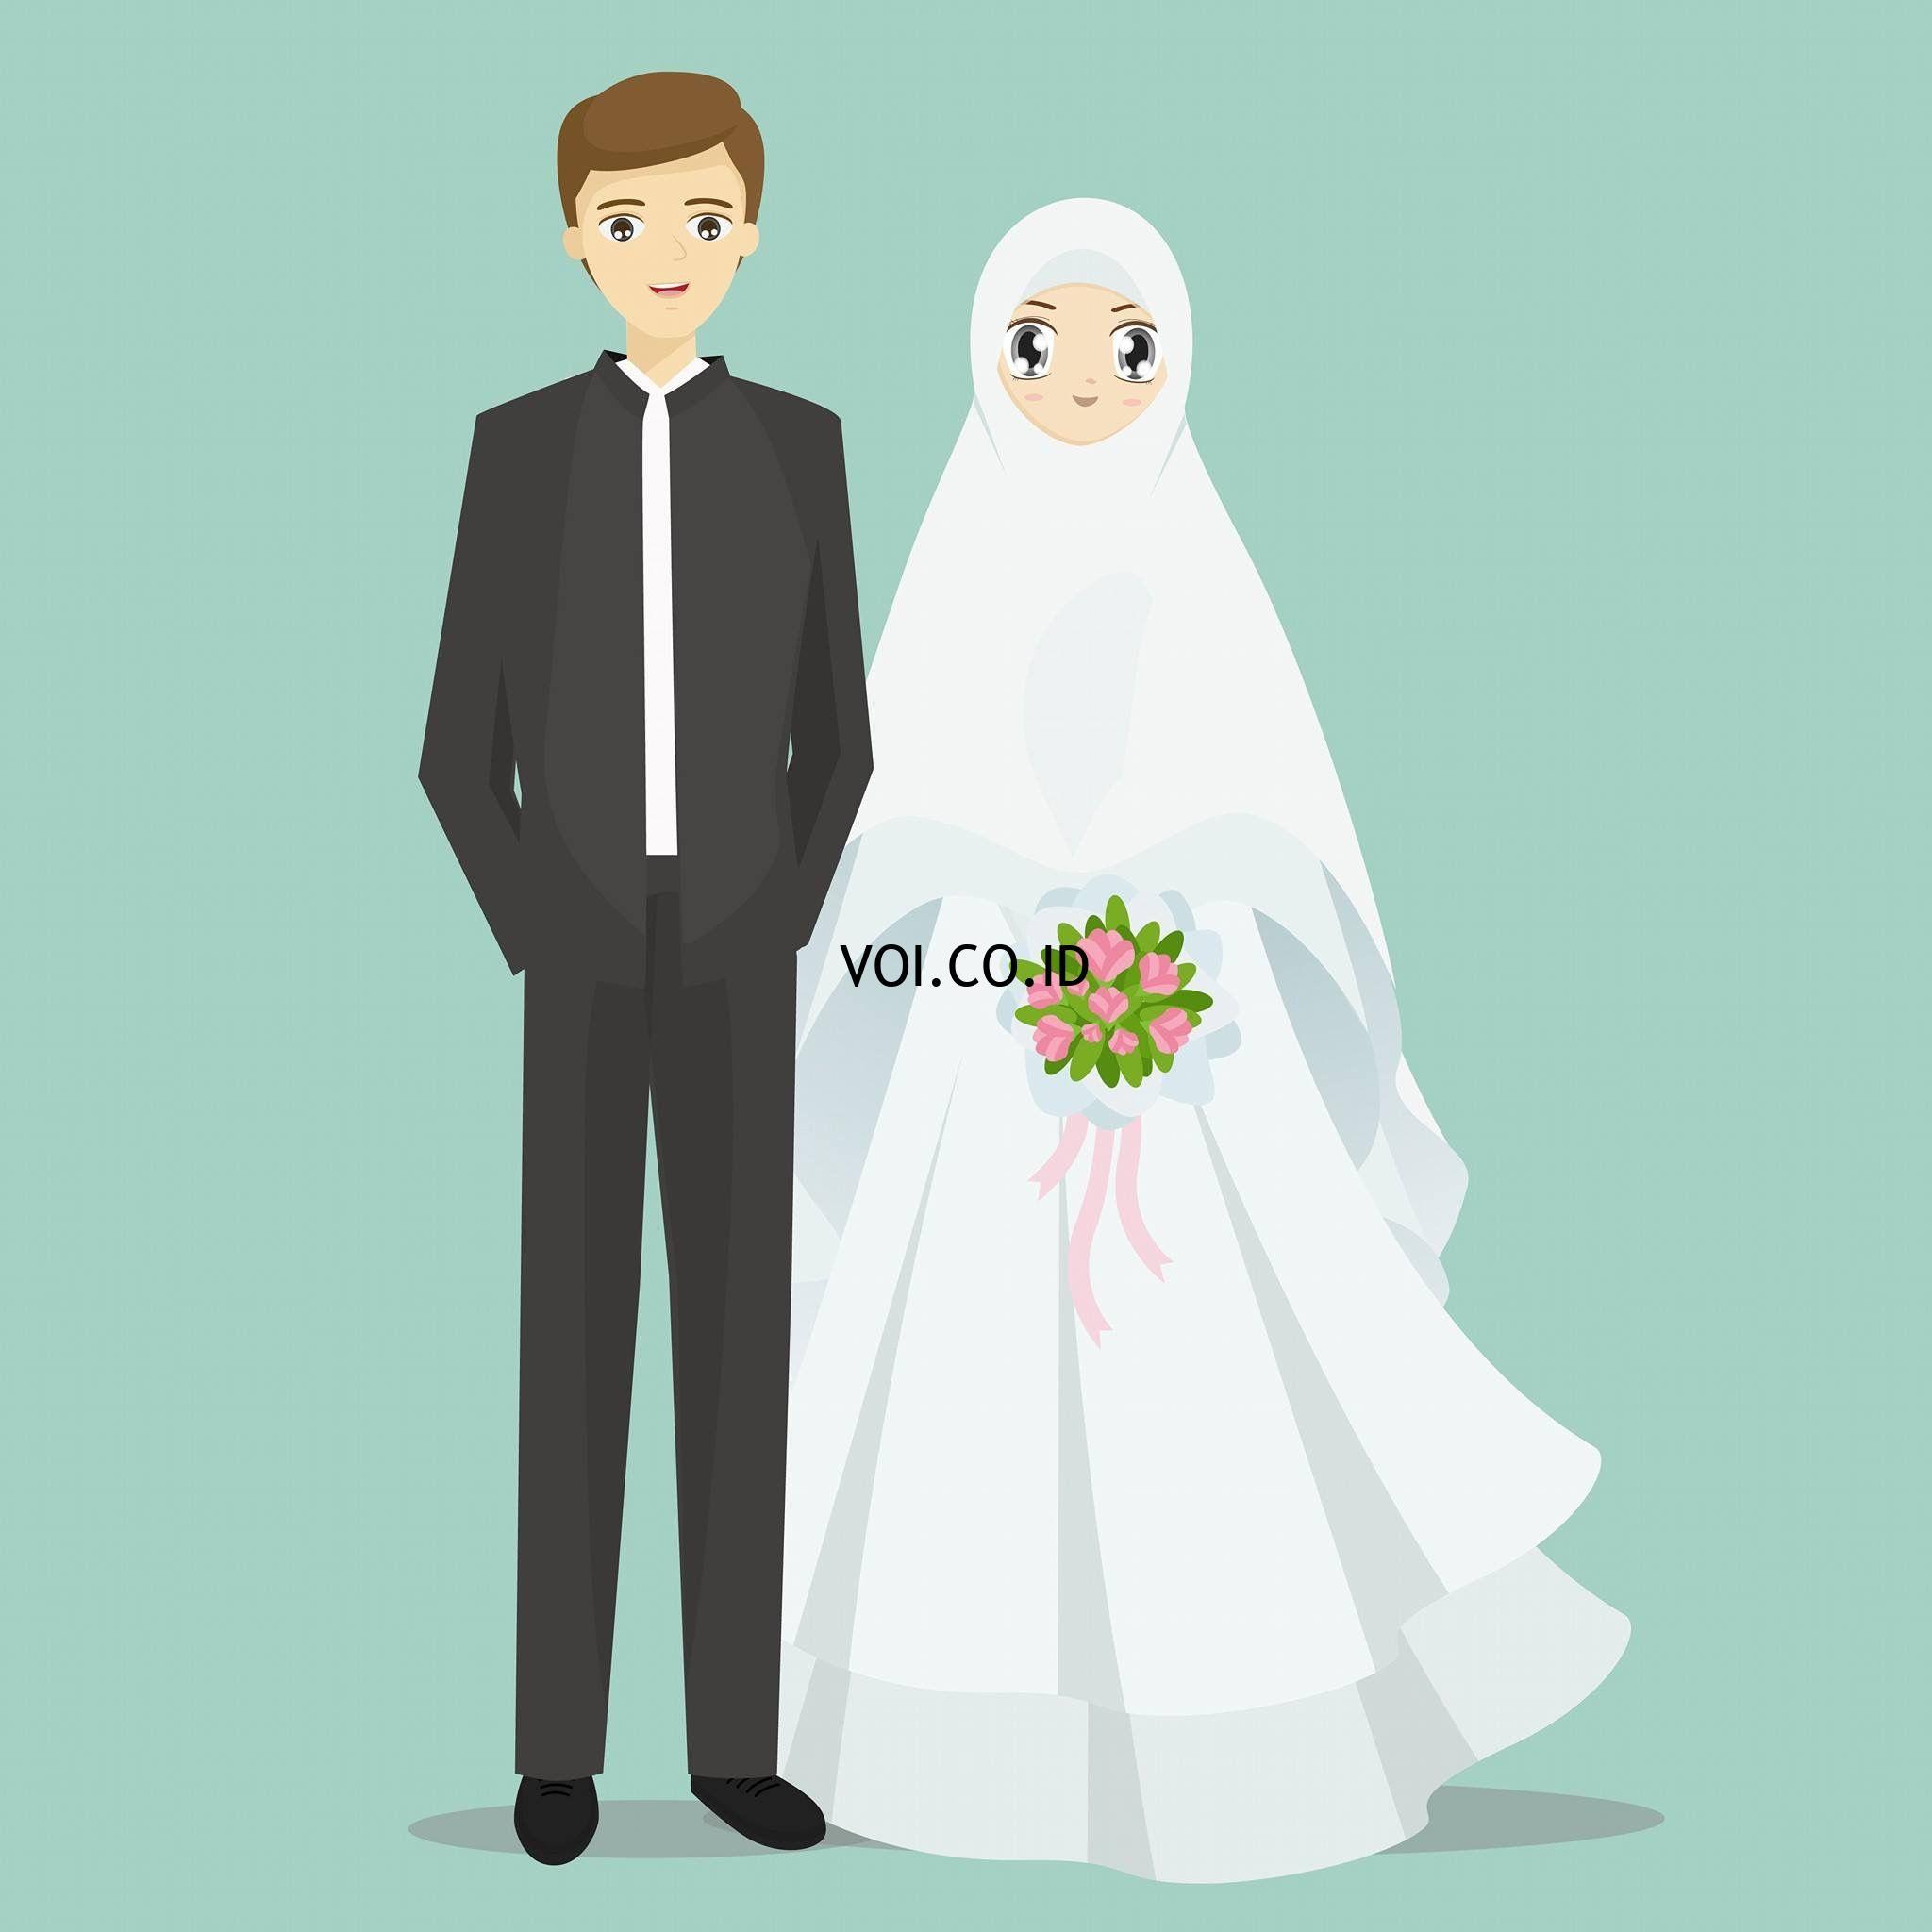 Ucapan-Pernikahan-untuk-Sahabat-Dalam-Bentuk-Formal